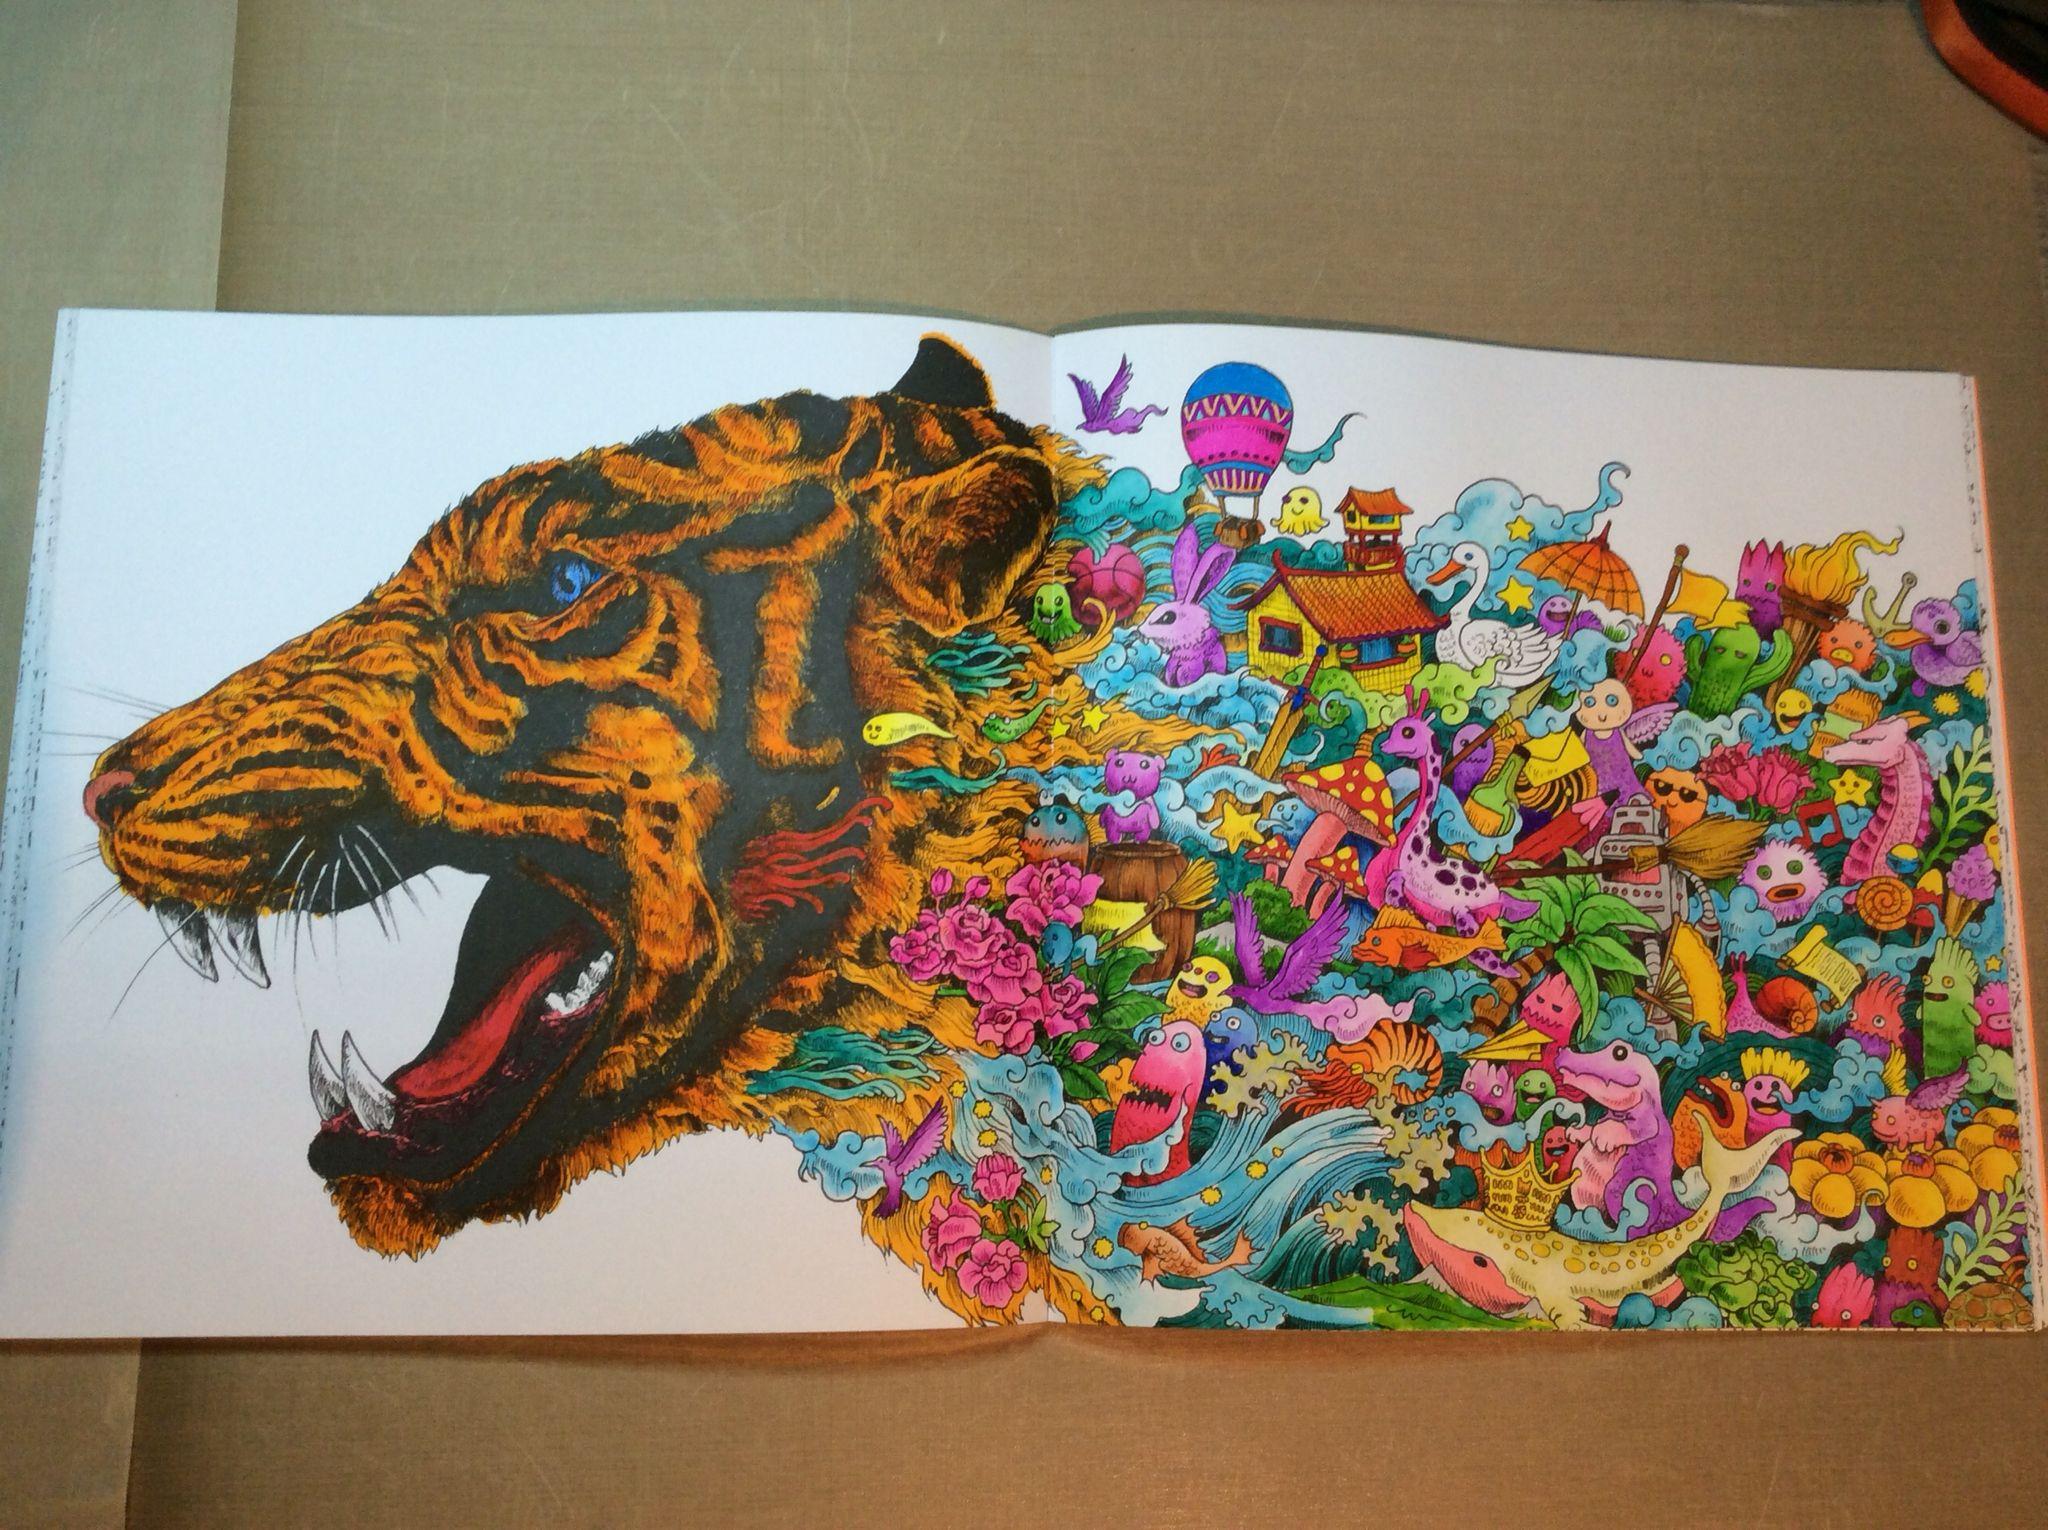 The coloring book clean - Animorphia Color Book Zig Clean Brush And Akashiya Sai Brushpen Briah Bat Aryeh